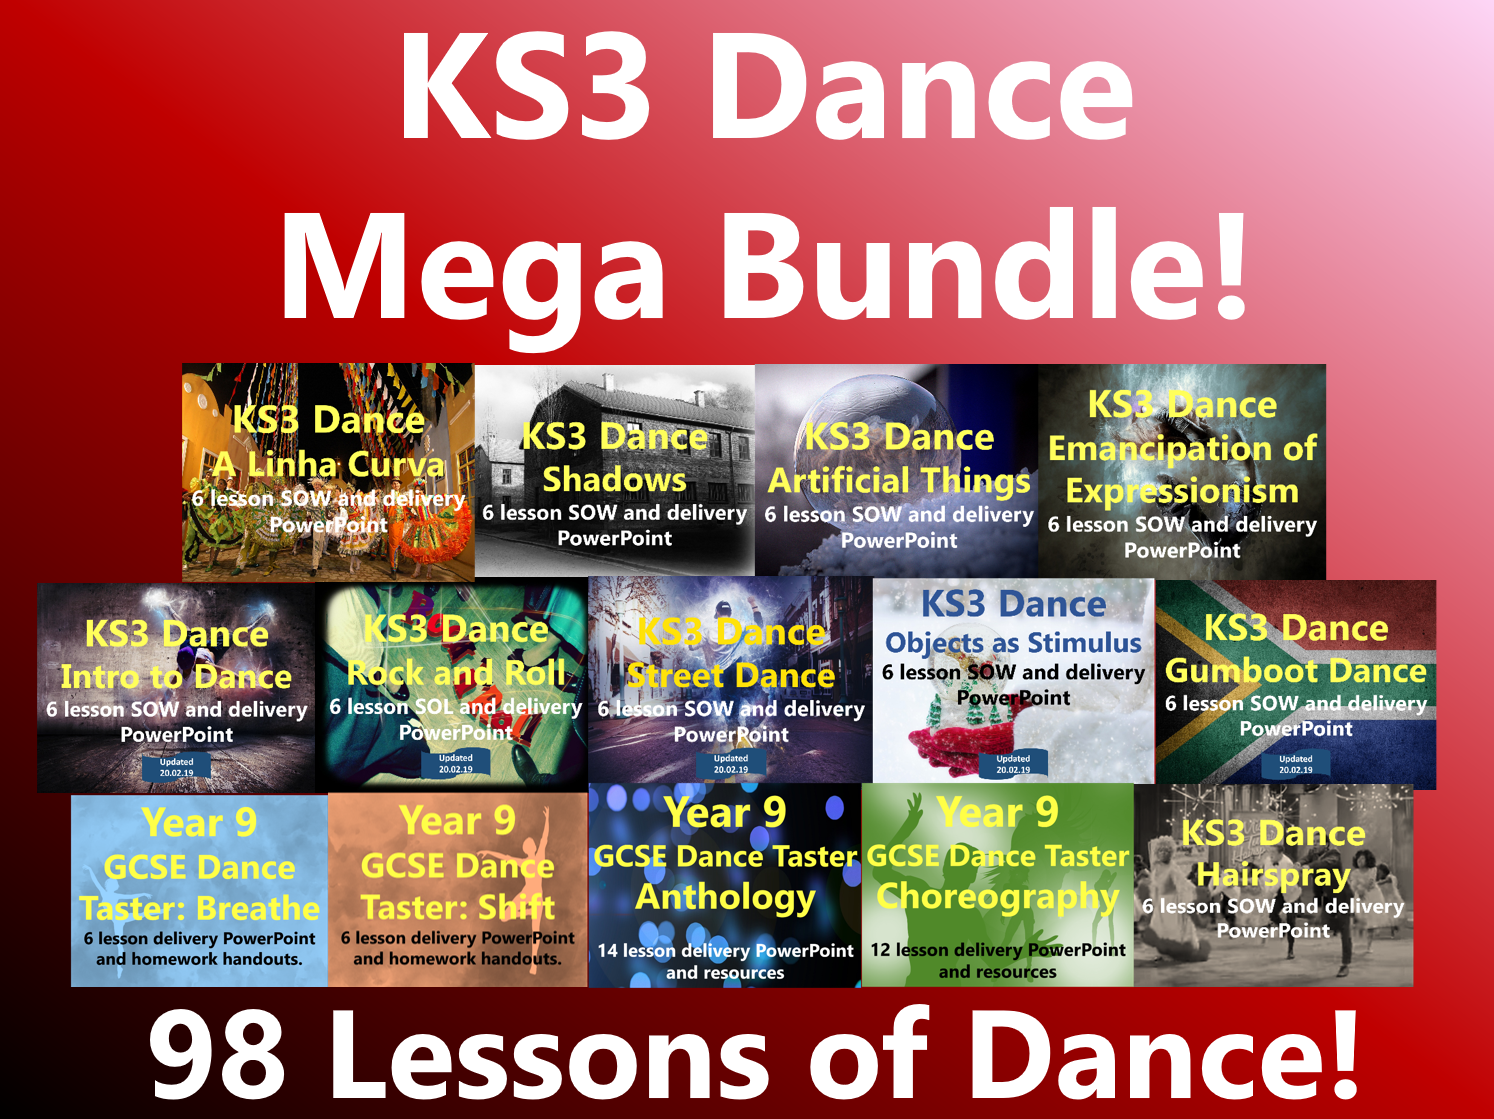 KS3 Dance Mega Bundle - 98 Lessons of Dance!